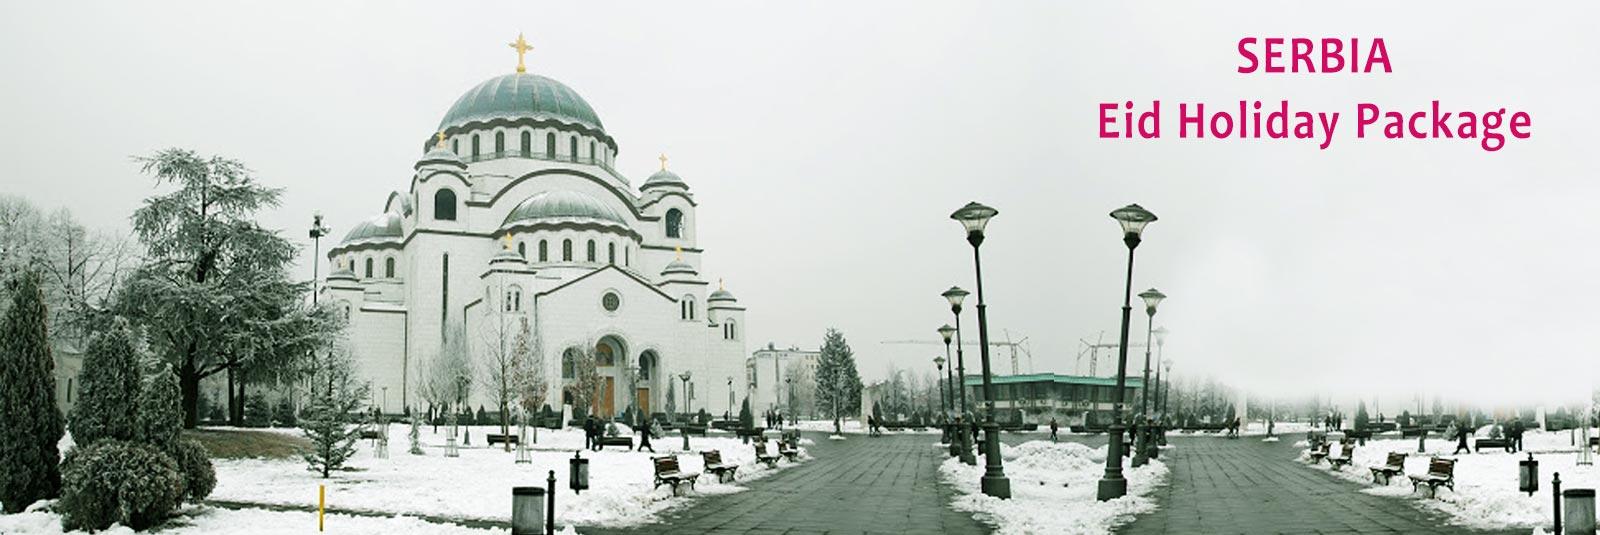 Serbia - Eid Holiday Package